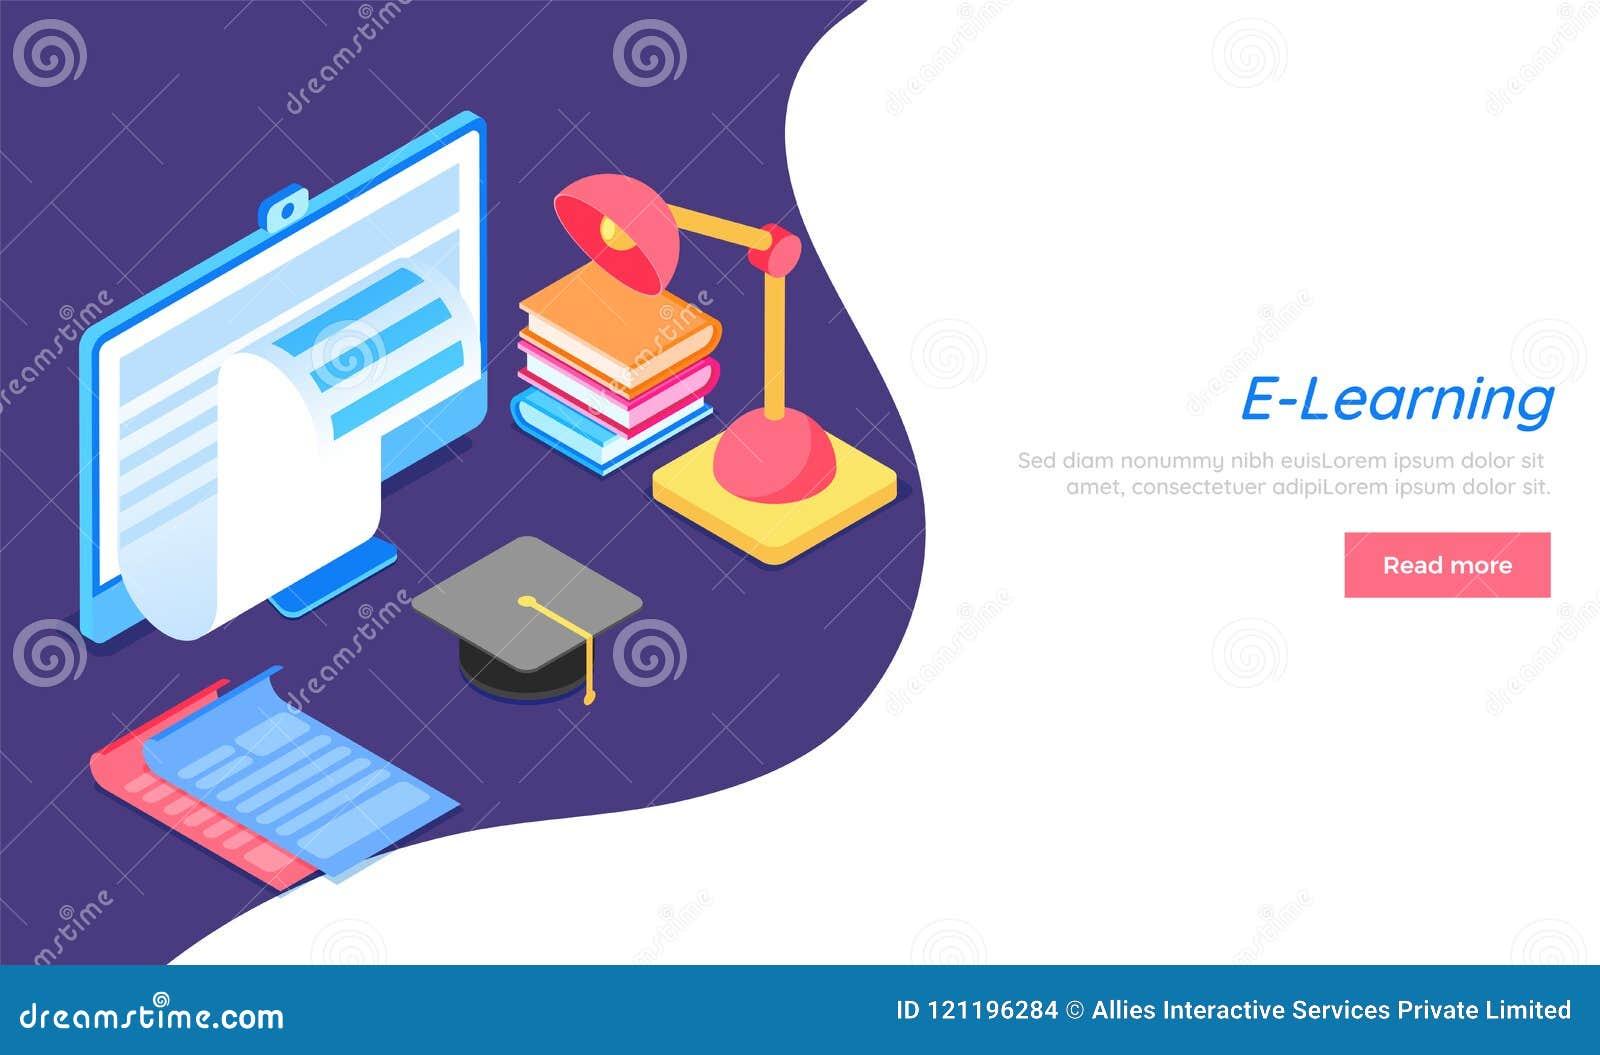 E-Learning Concept Based Website Template Or Hero Banner Design ...